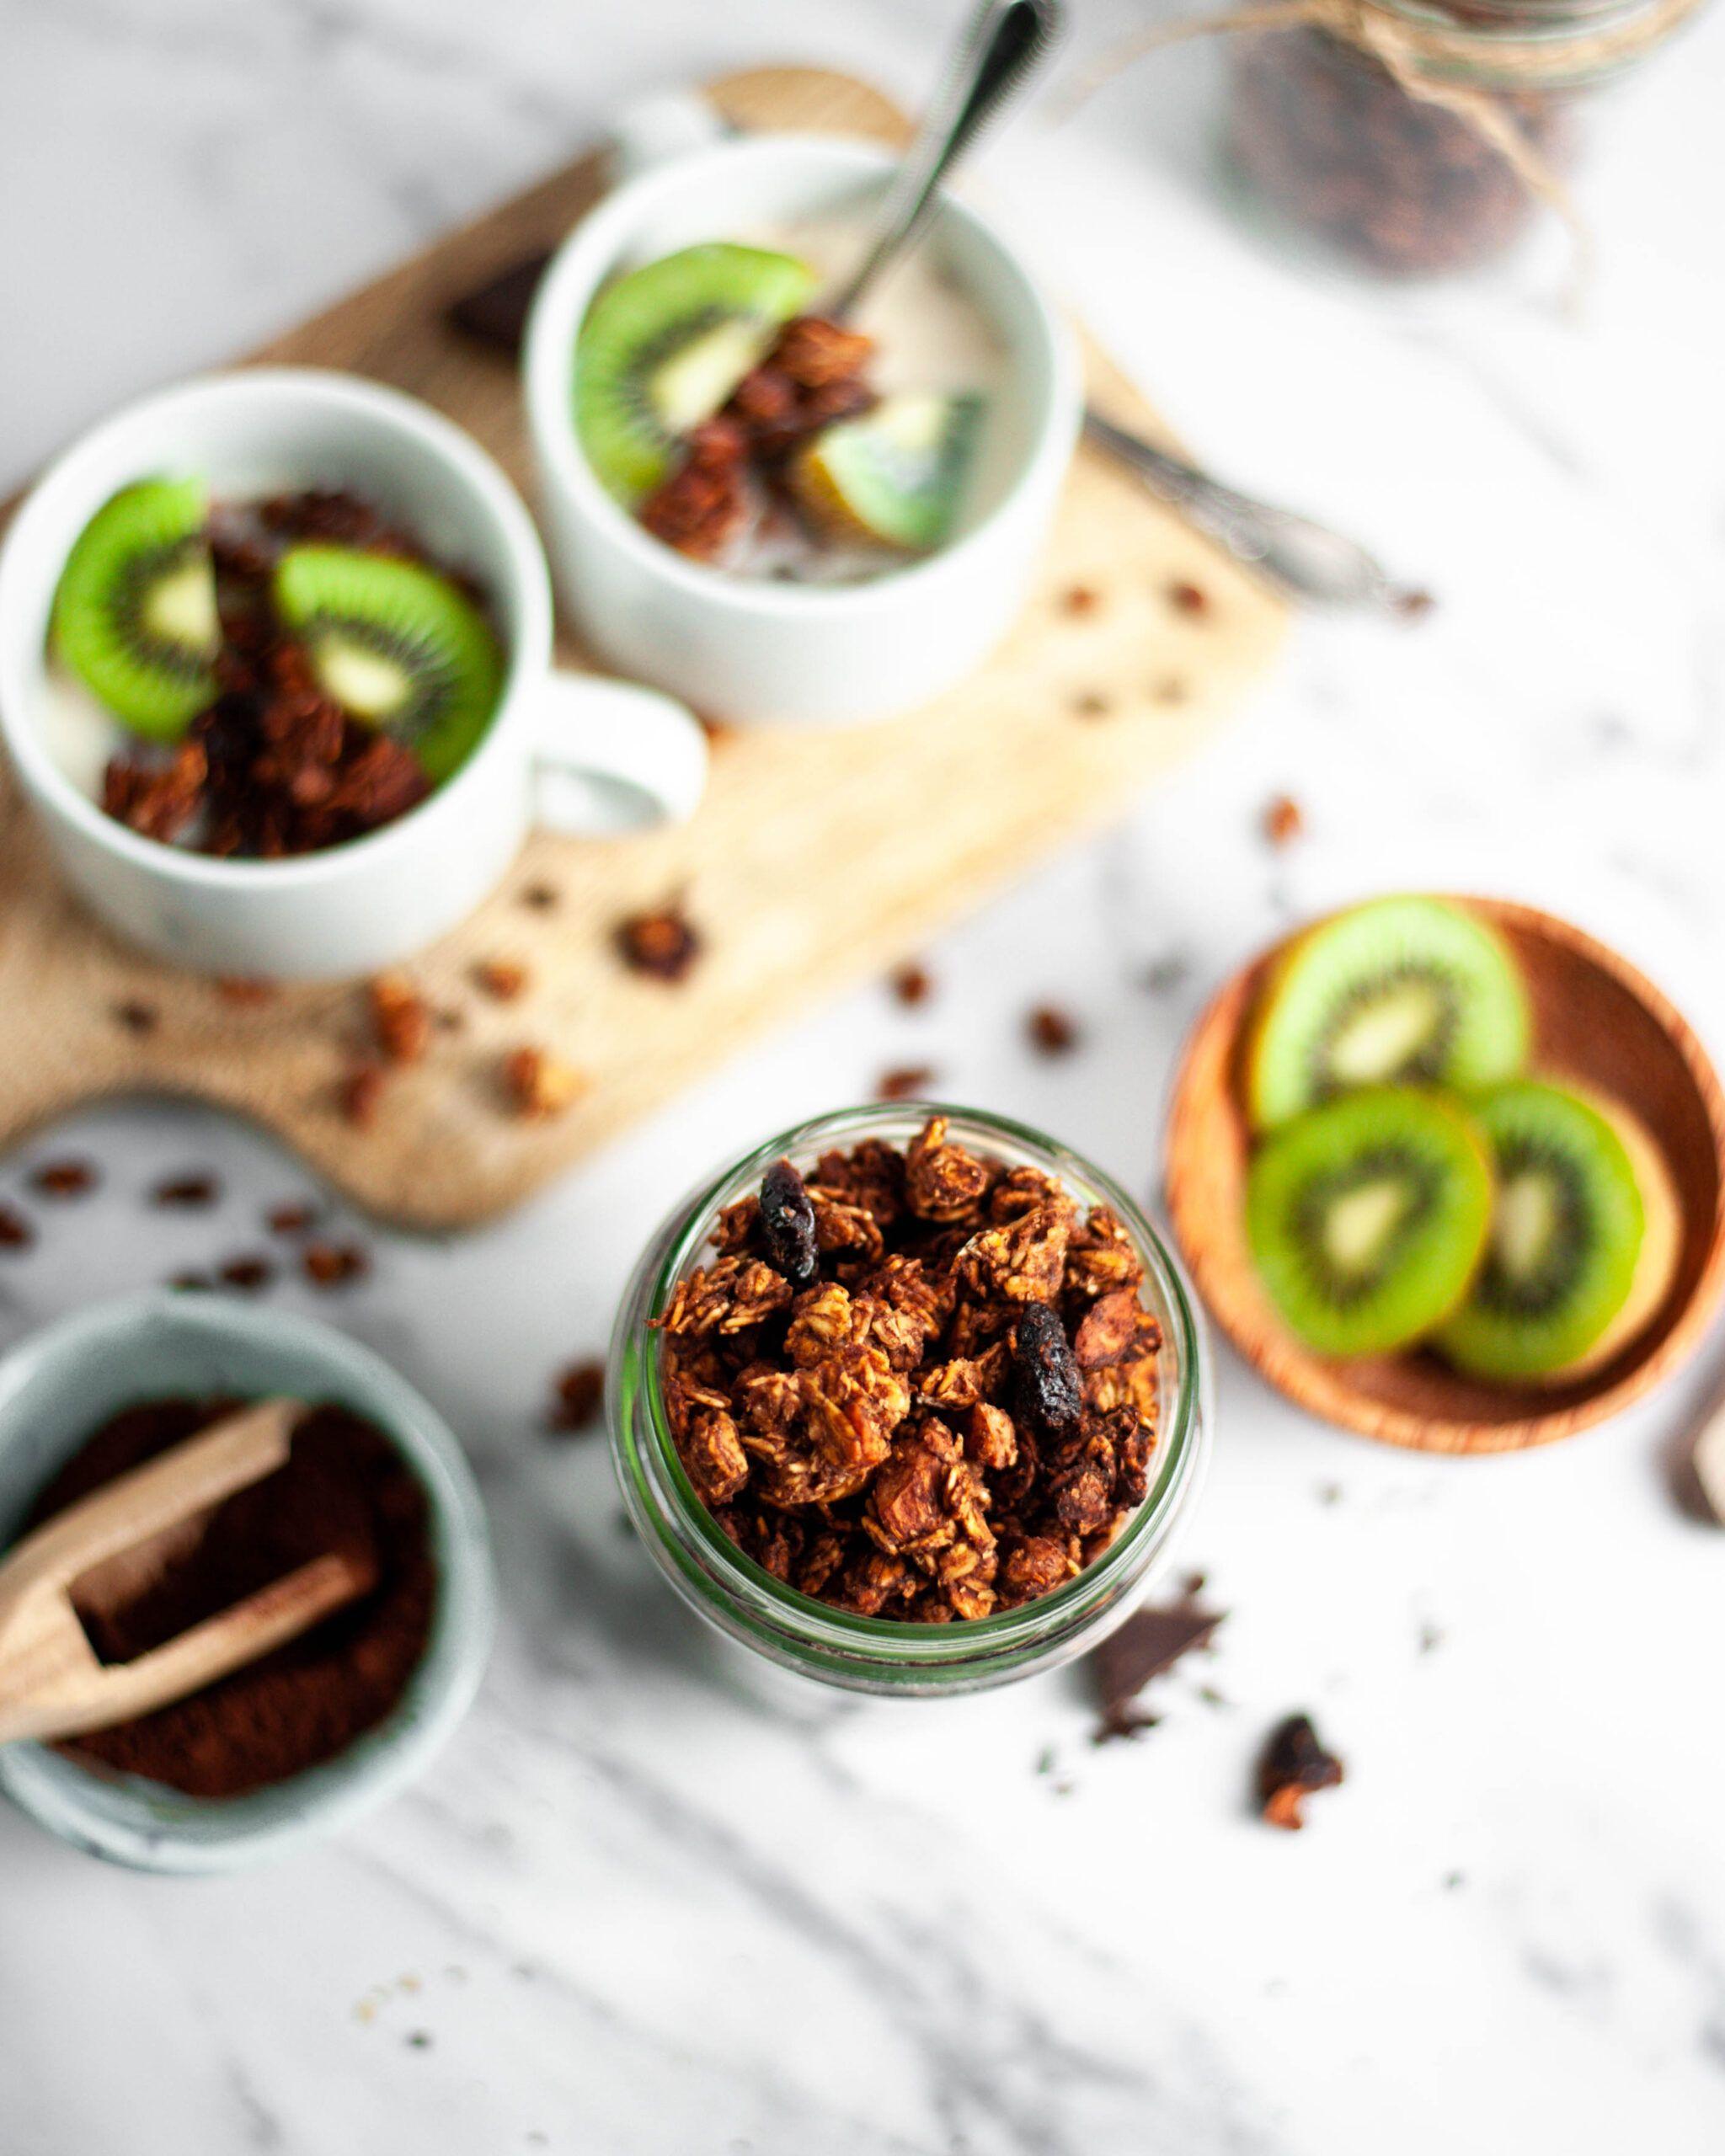 Chocolate vegan granola